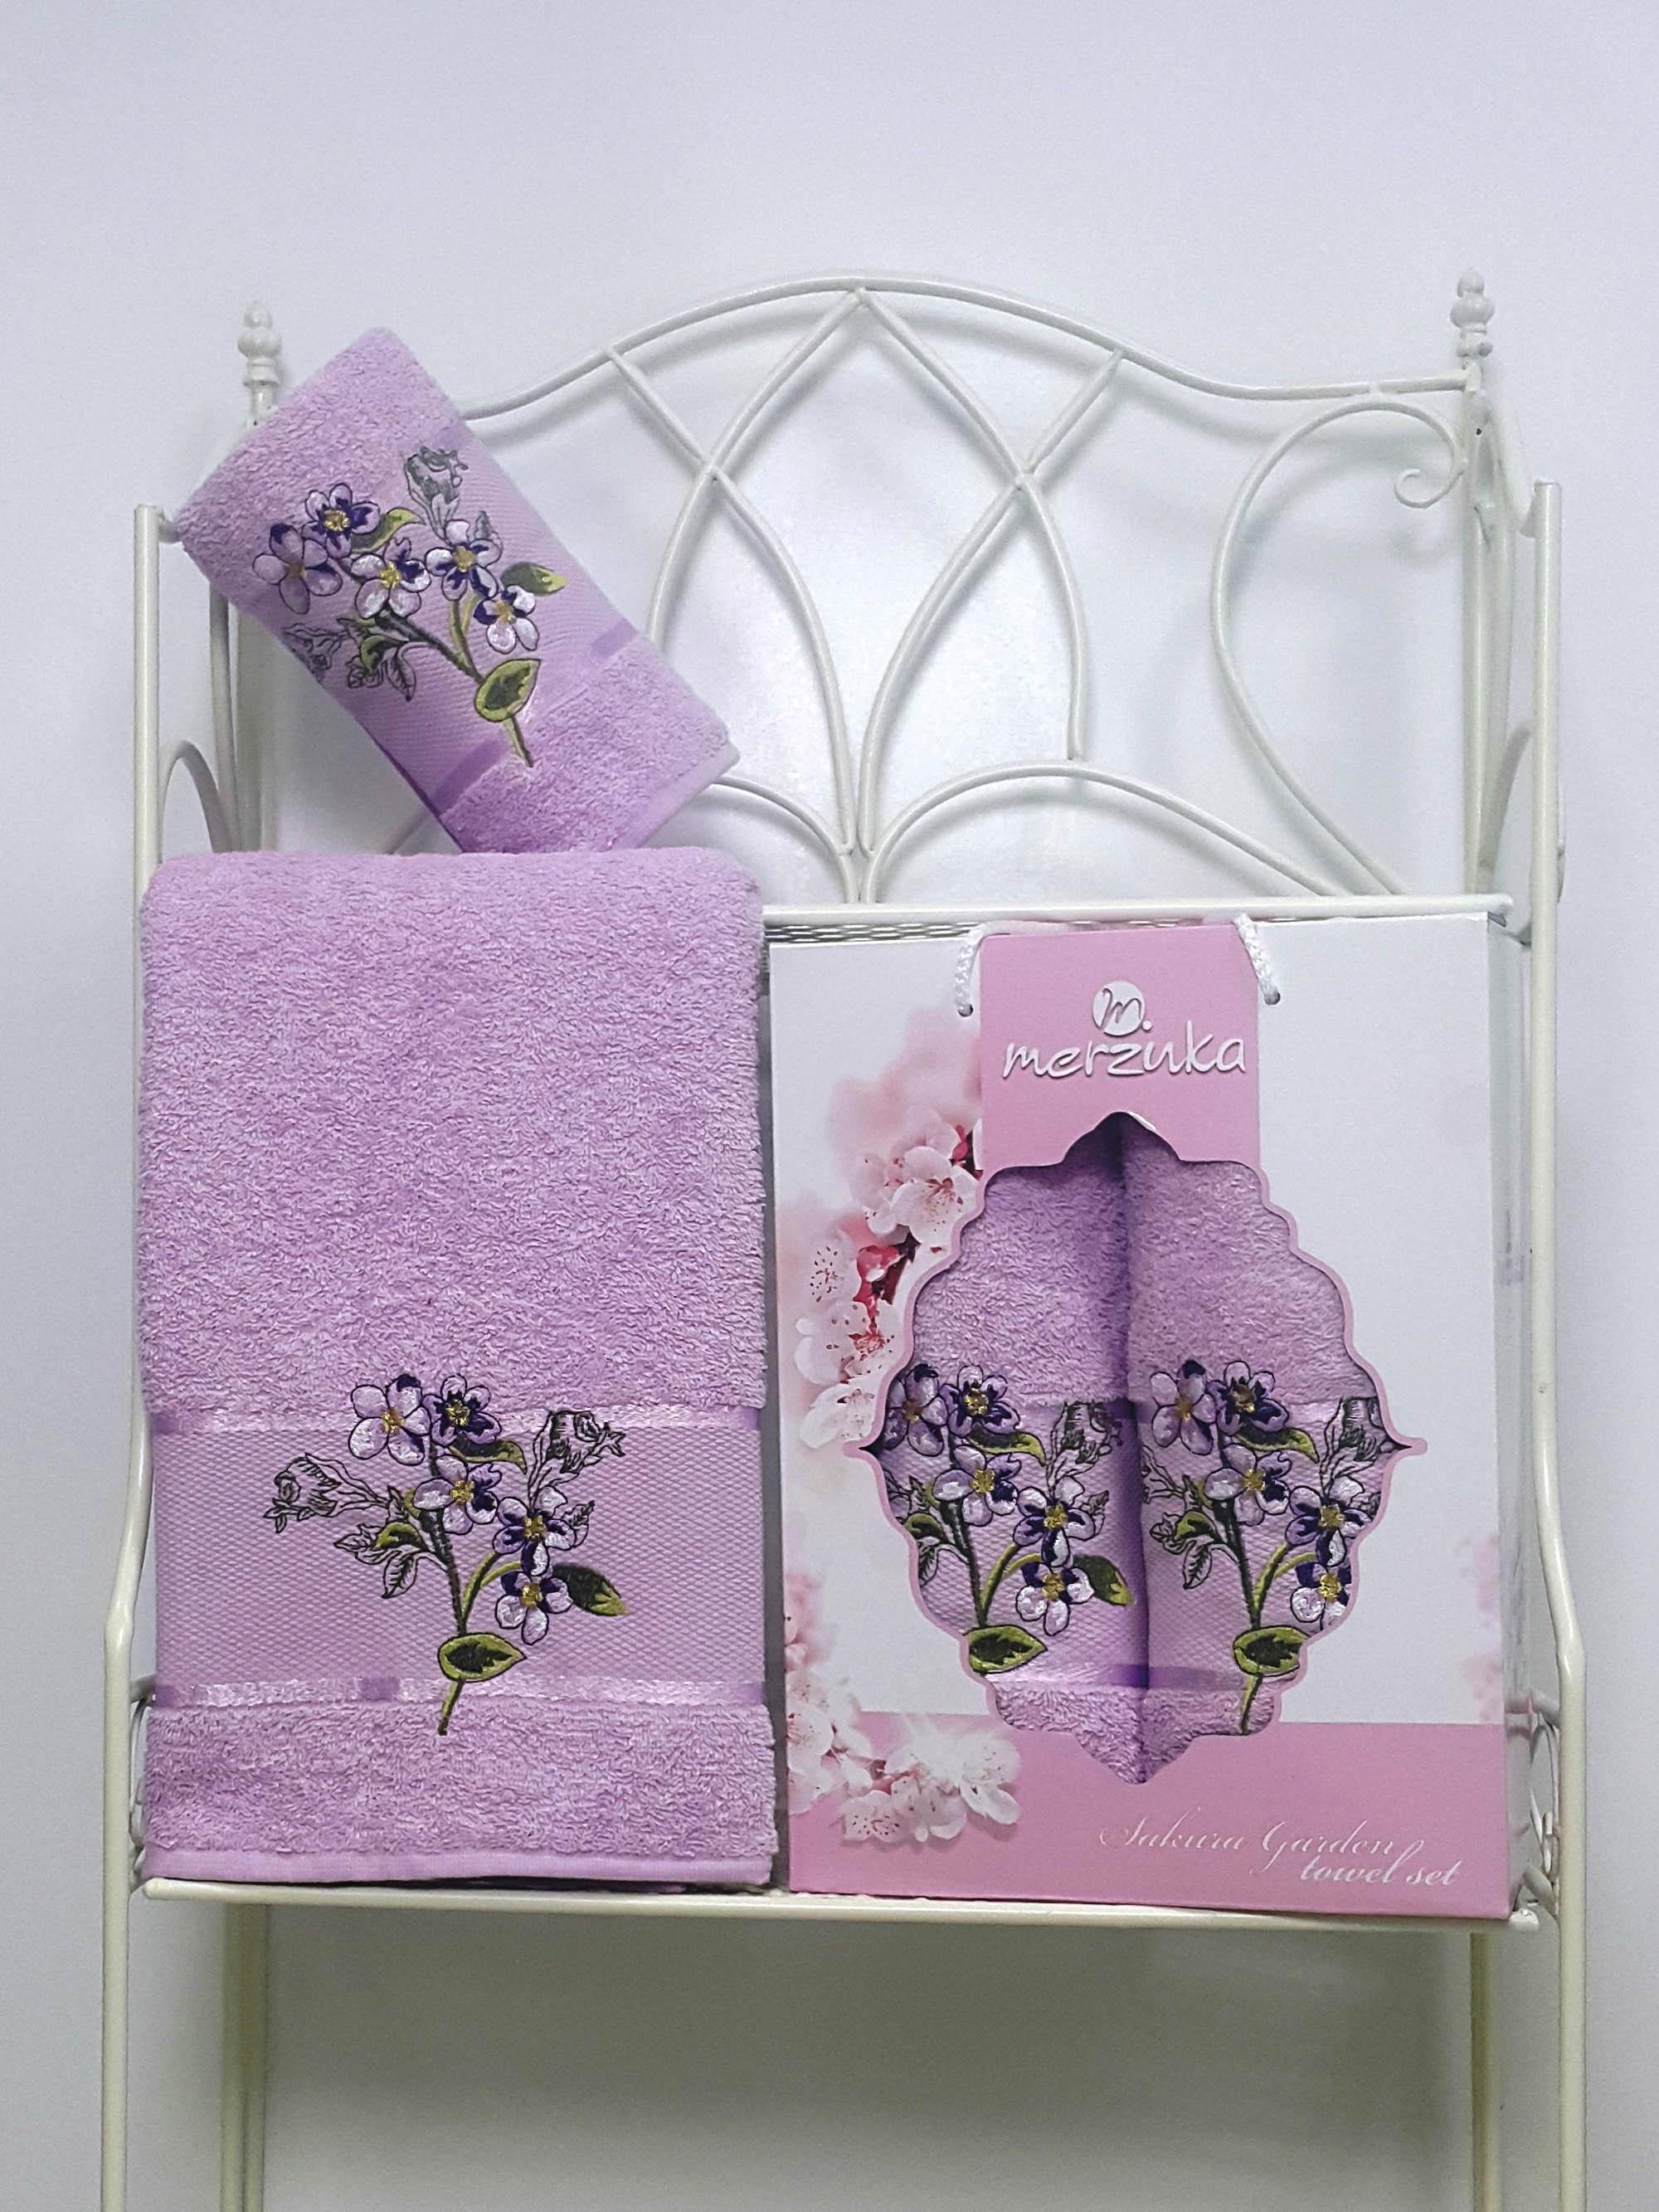 Полотенца Oran Merzuka Набор из 2 полотенец Sakura Garden Цвет: Сиреневый набор из 2 полотенец merzuka sakura 50х90 70х140 8430 кремовый